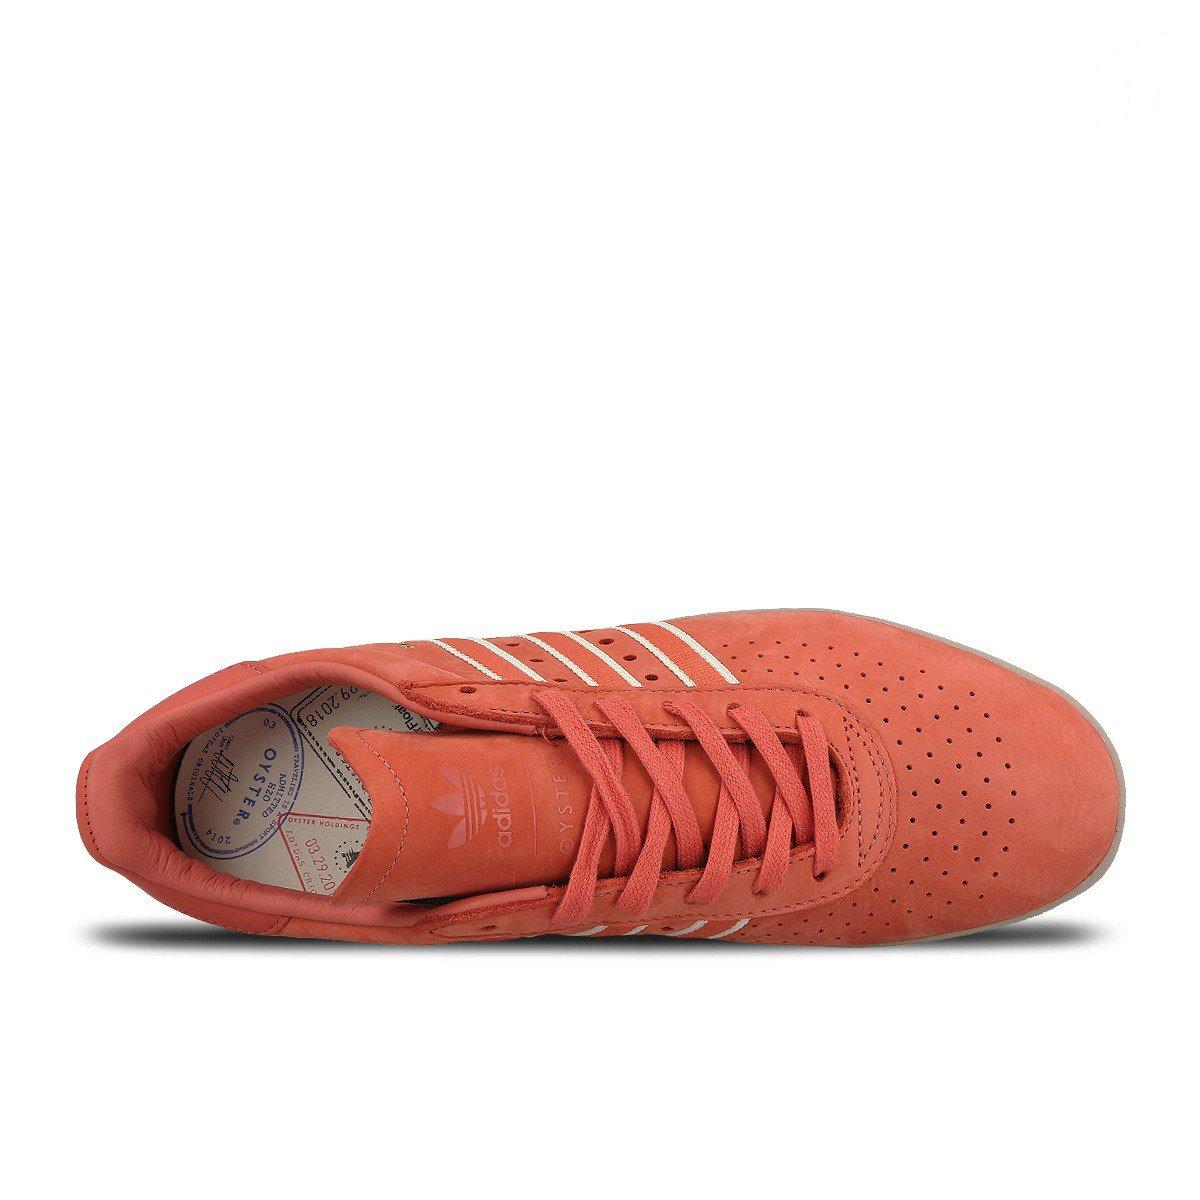 the best attitude 2ff34 0804d Amazon.com  adidas Men Oyster Holdings 350 (redTrace ScarletChalk  WhiteMetallic Gold)  Fashion Sneakers